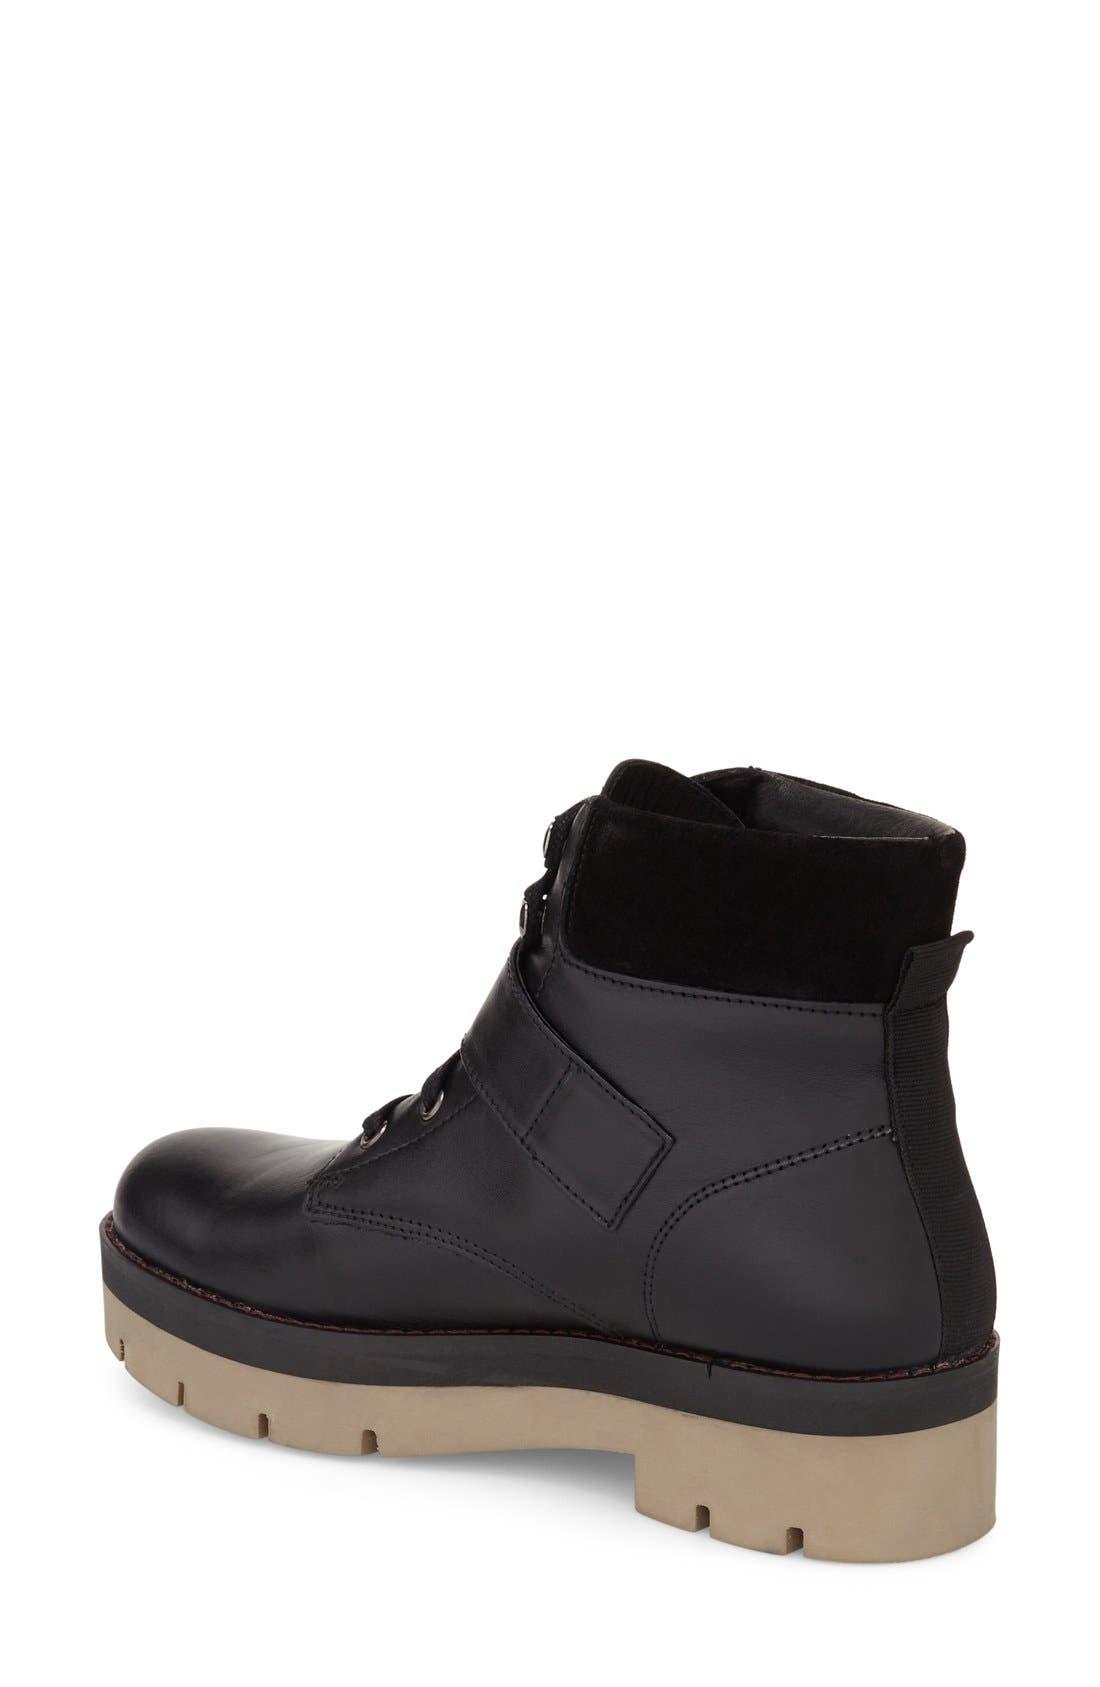 Alternate Image 2  - Topshop Autumn Platform Boot (Women)